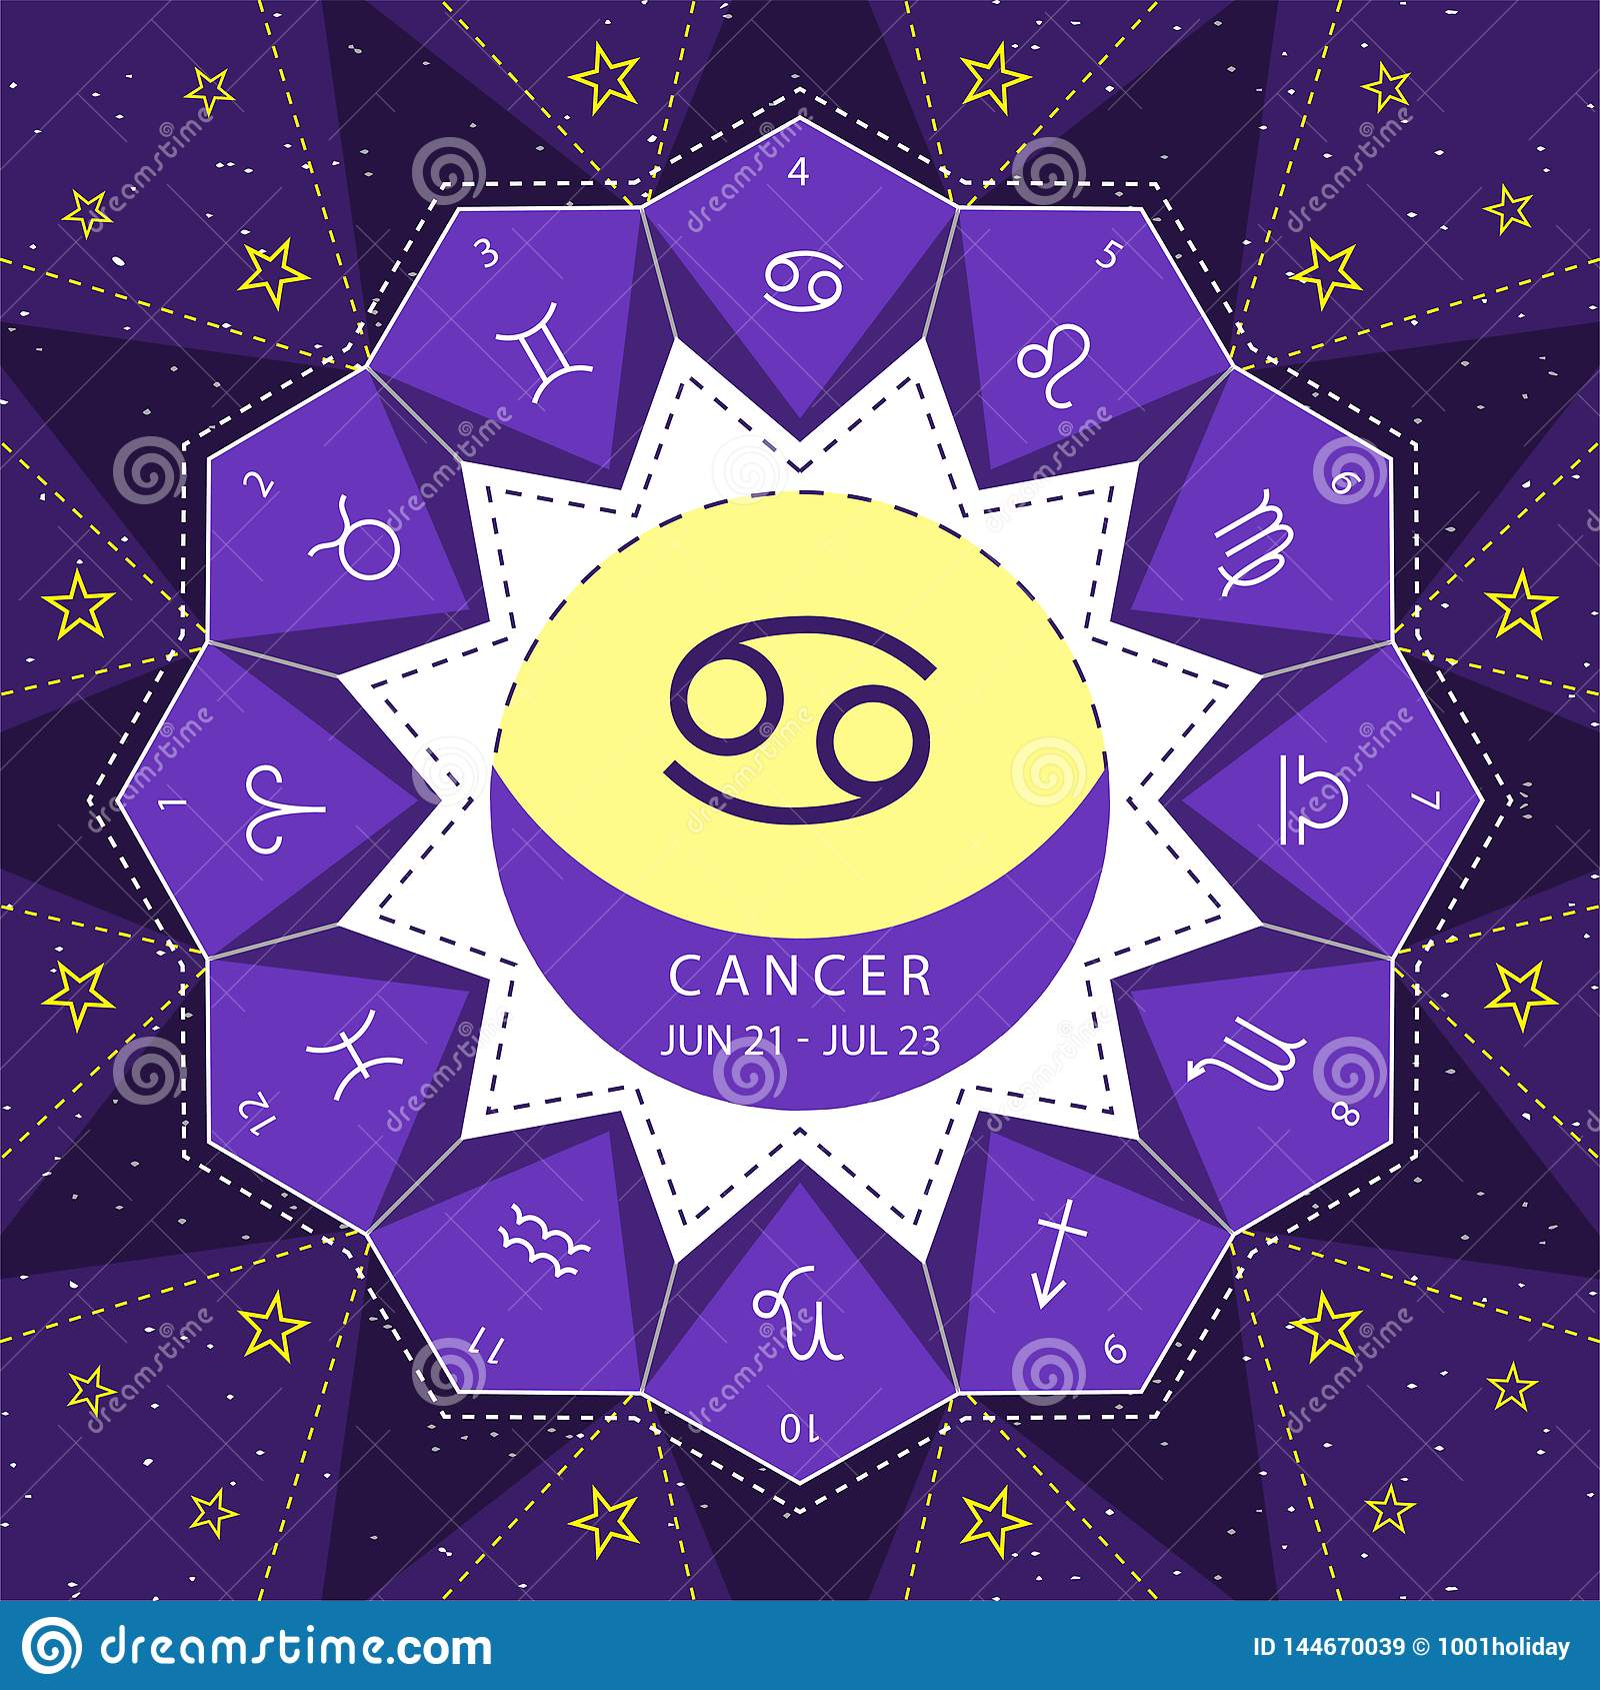 рак Знаки зодиака конспектируют вектор стиля установили на предпосылку неба звезды